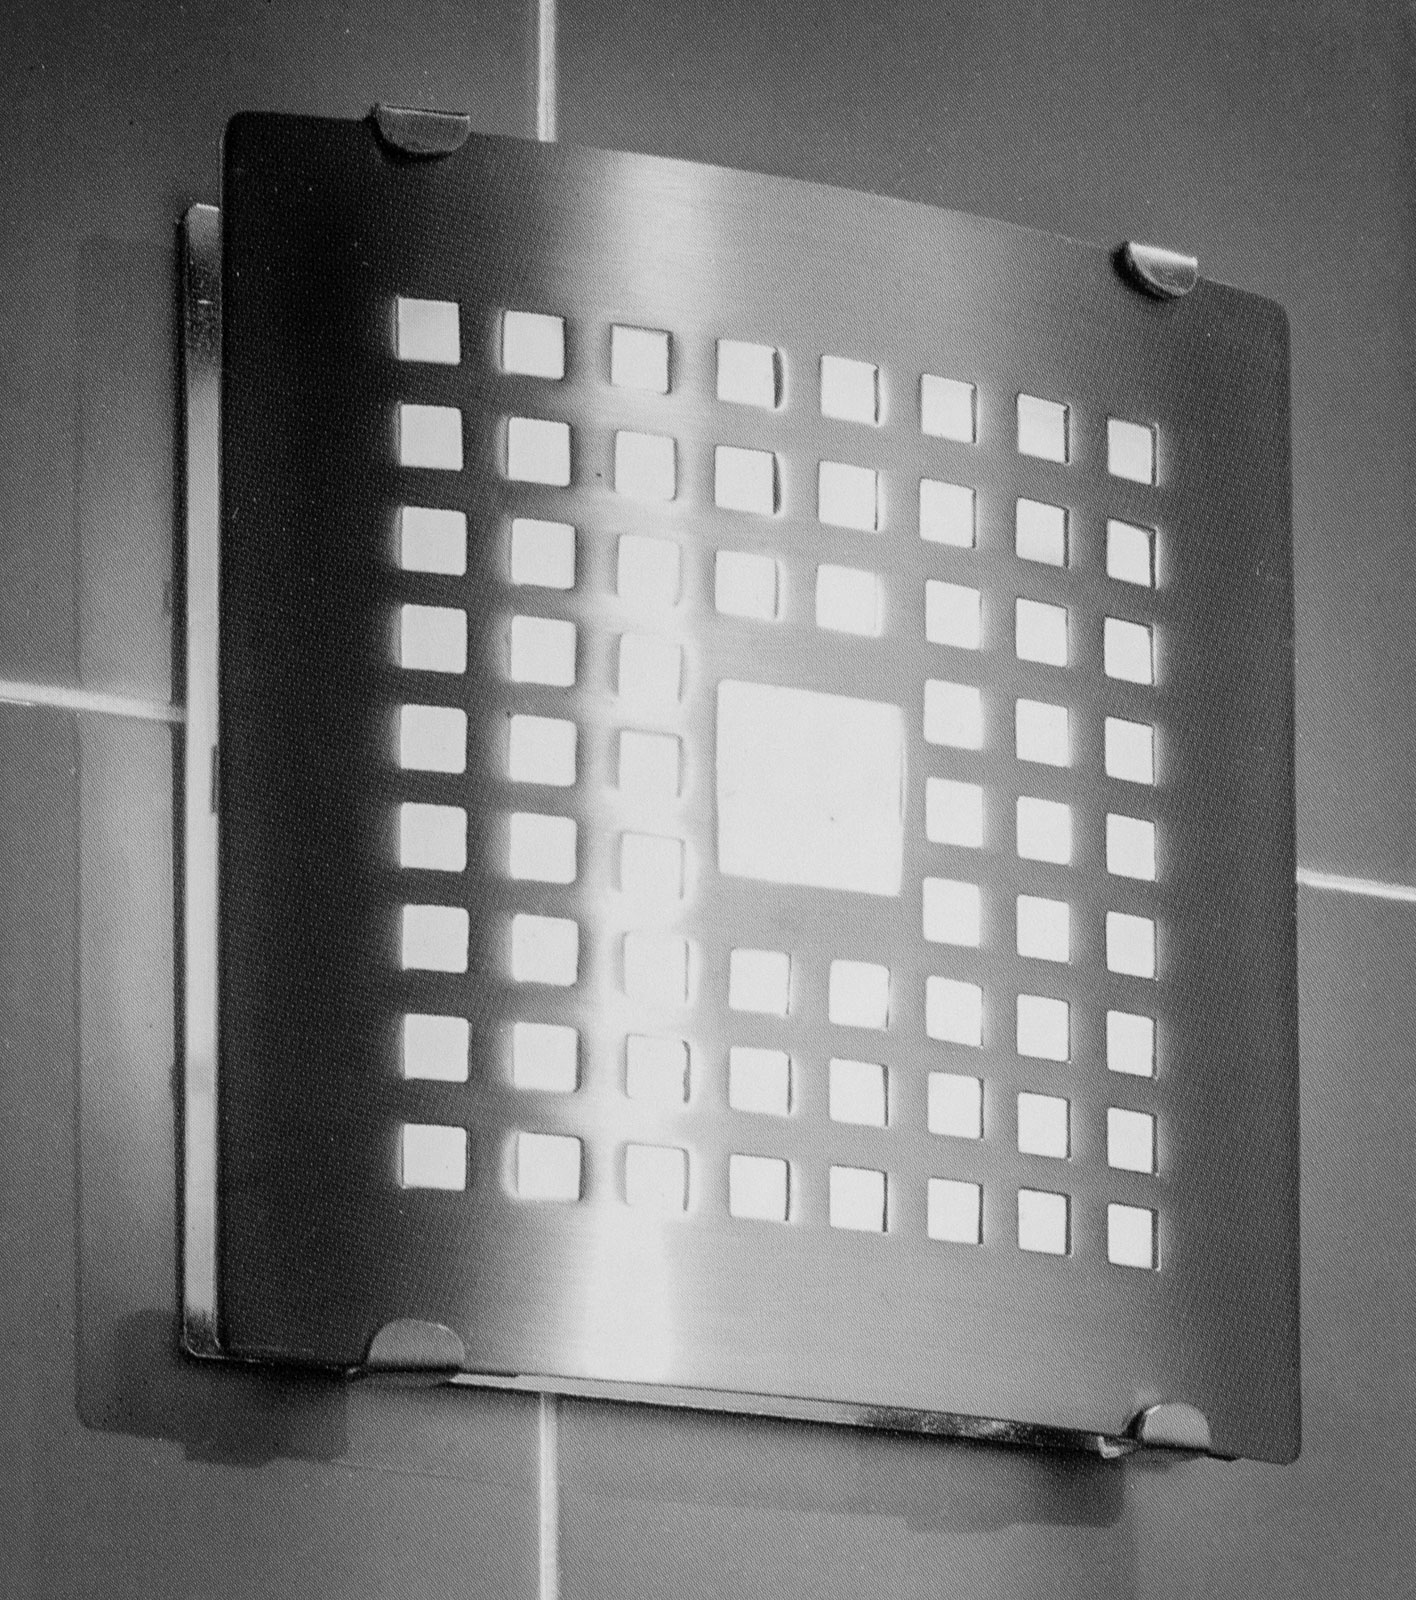 Ventilator 100 N Chrom Glas Abdeckung Badlufter Badventilator Deckenlufter Ebay